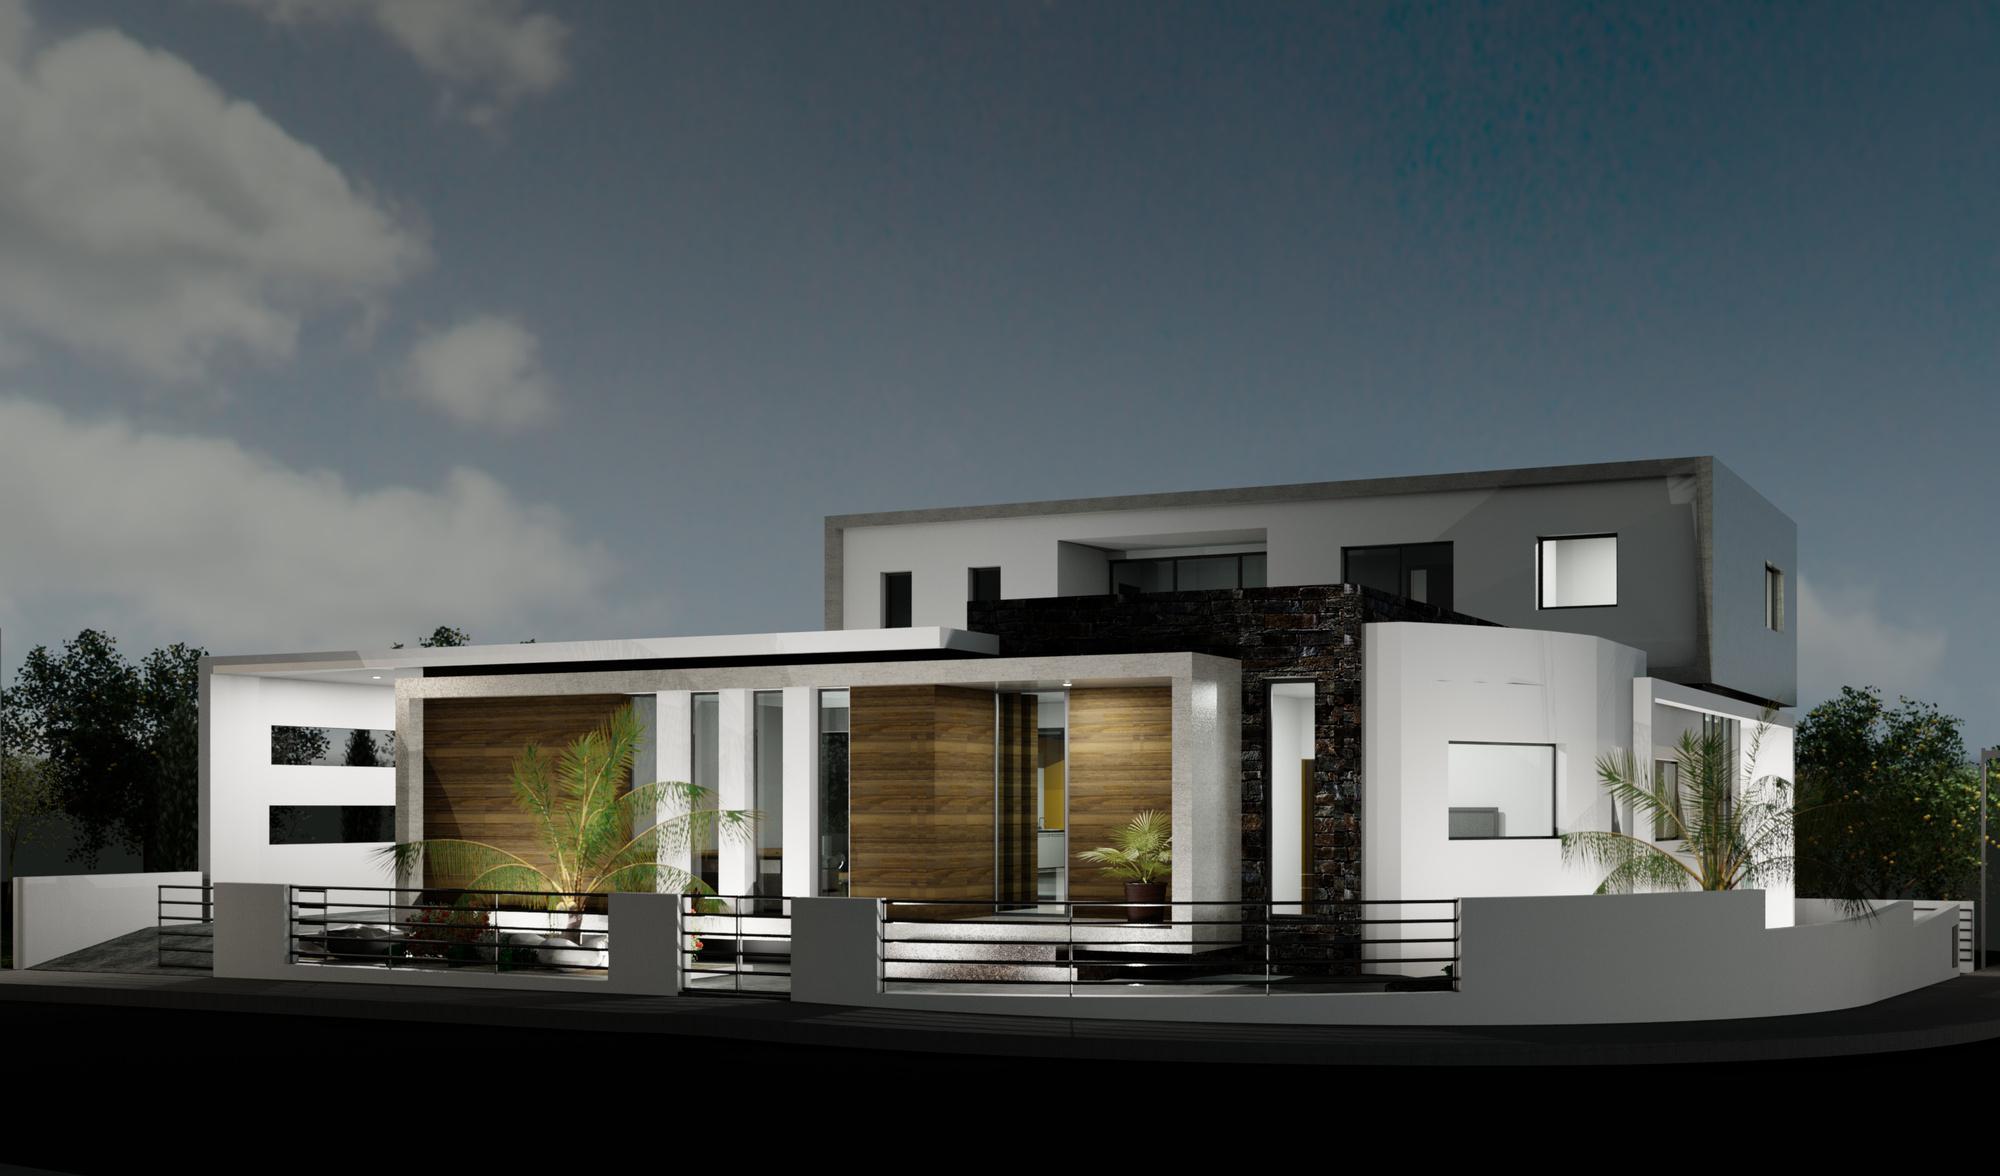 Raas-rendering20141222-15806-1e7f0b0